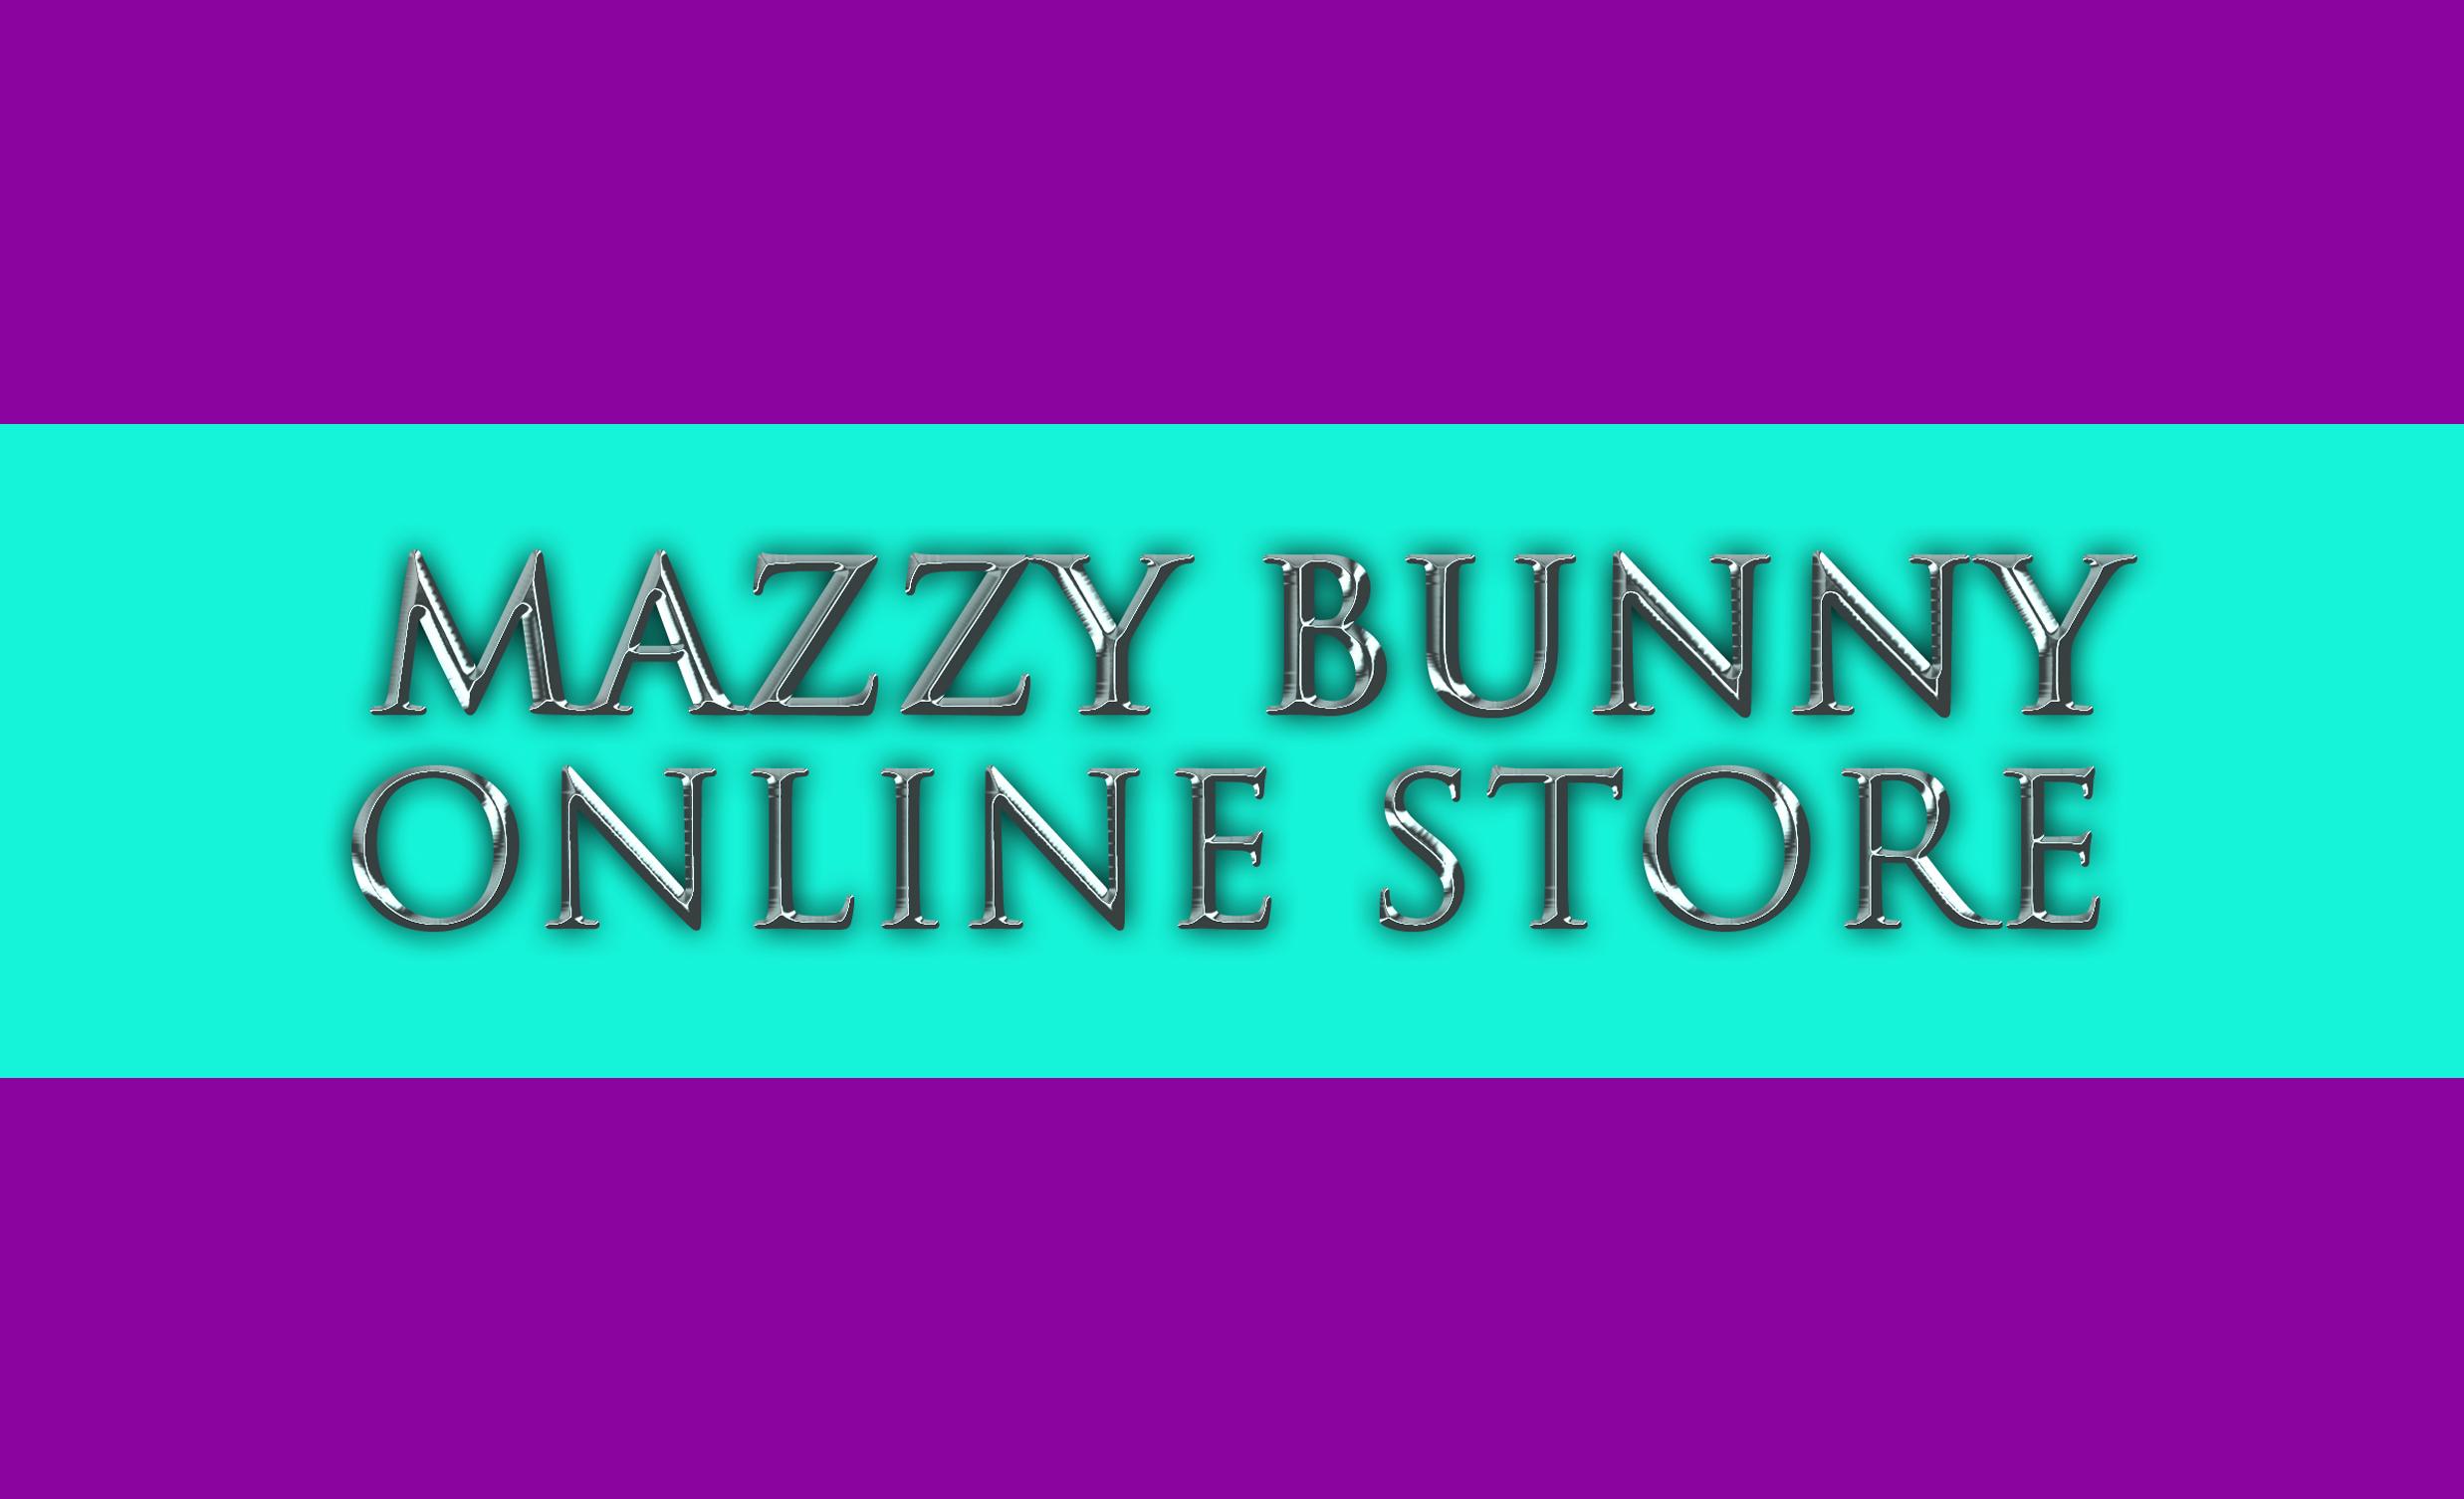 Mazzy Bunny Inc.